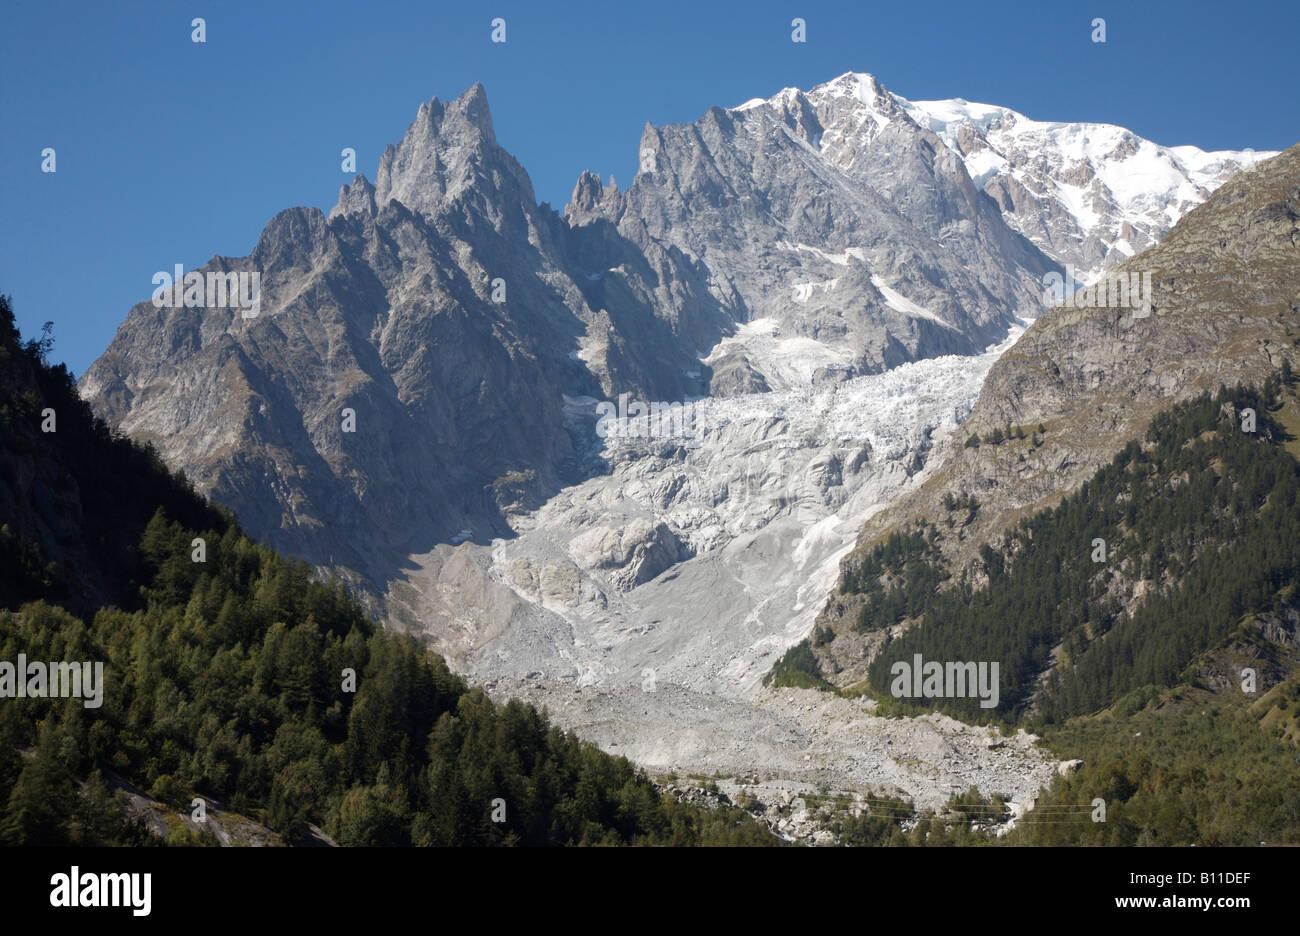 Aostatal, Blick auf den Mont Blanc - Stock Image